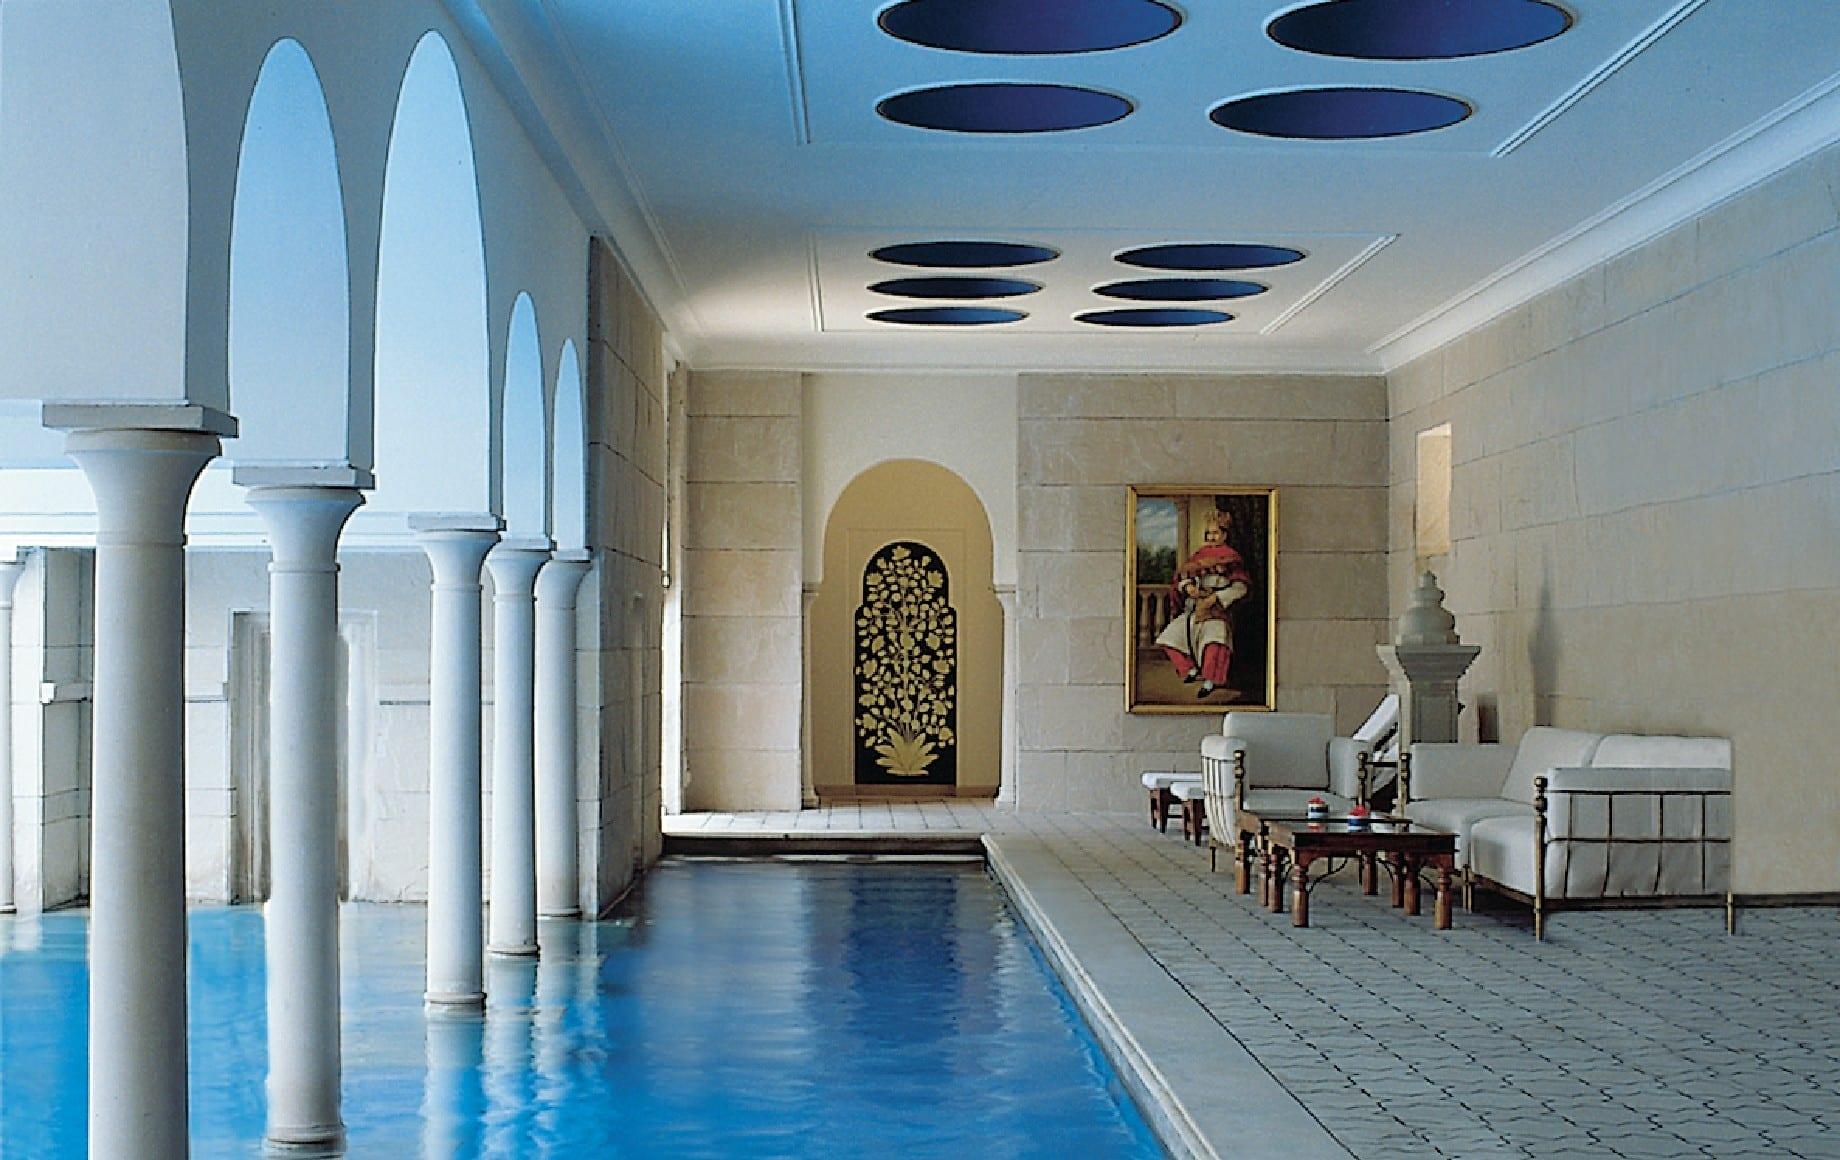 a pool room